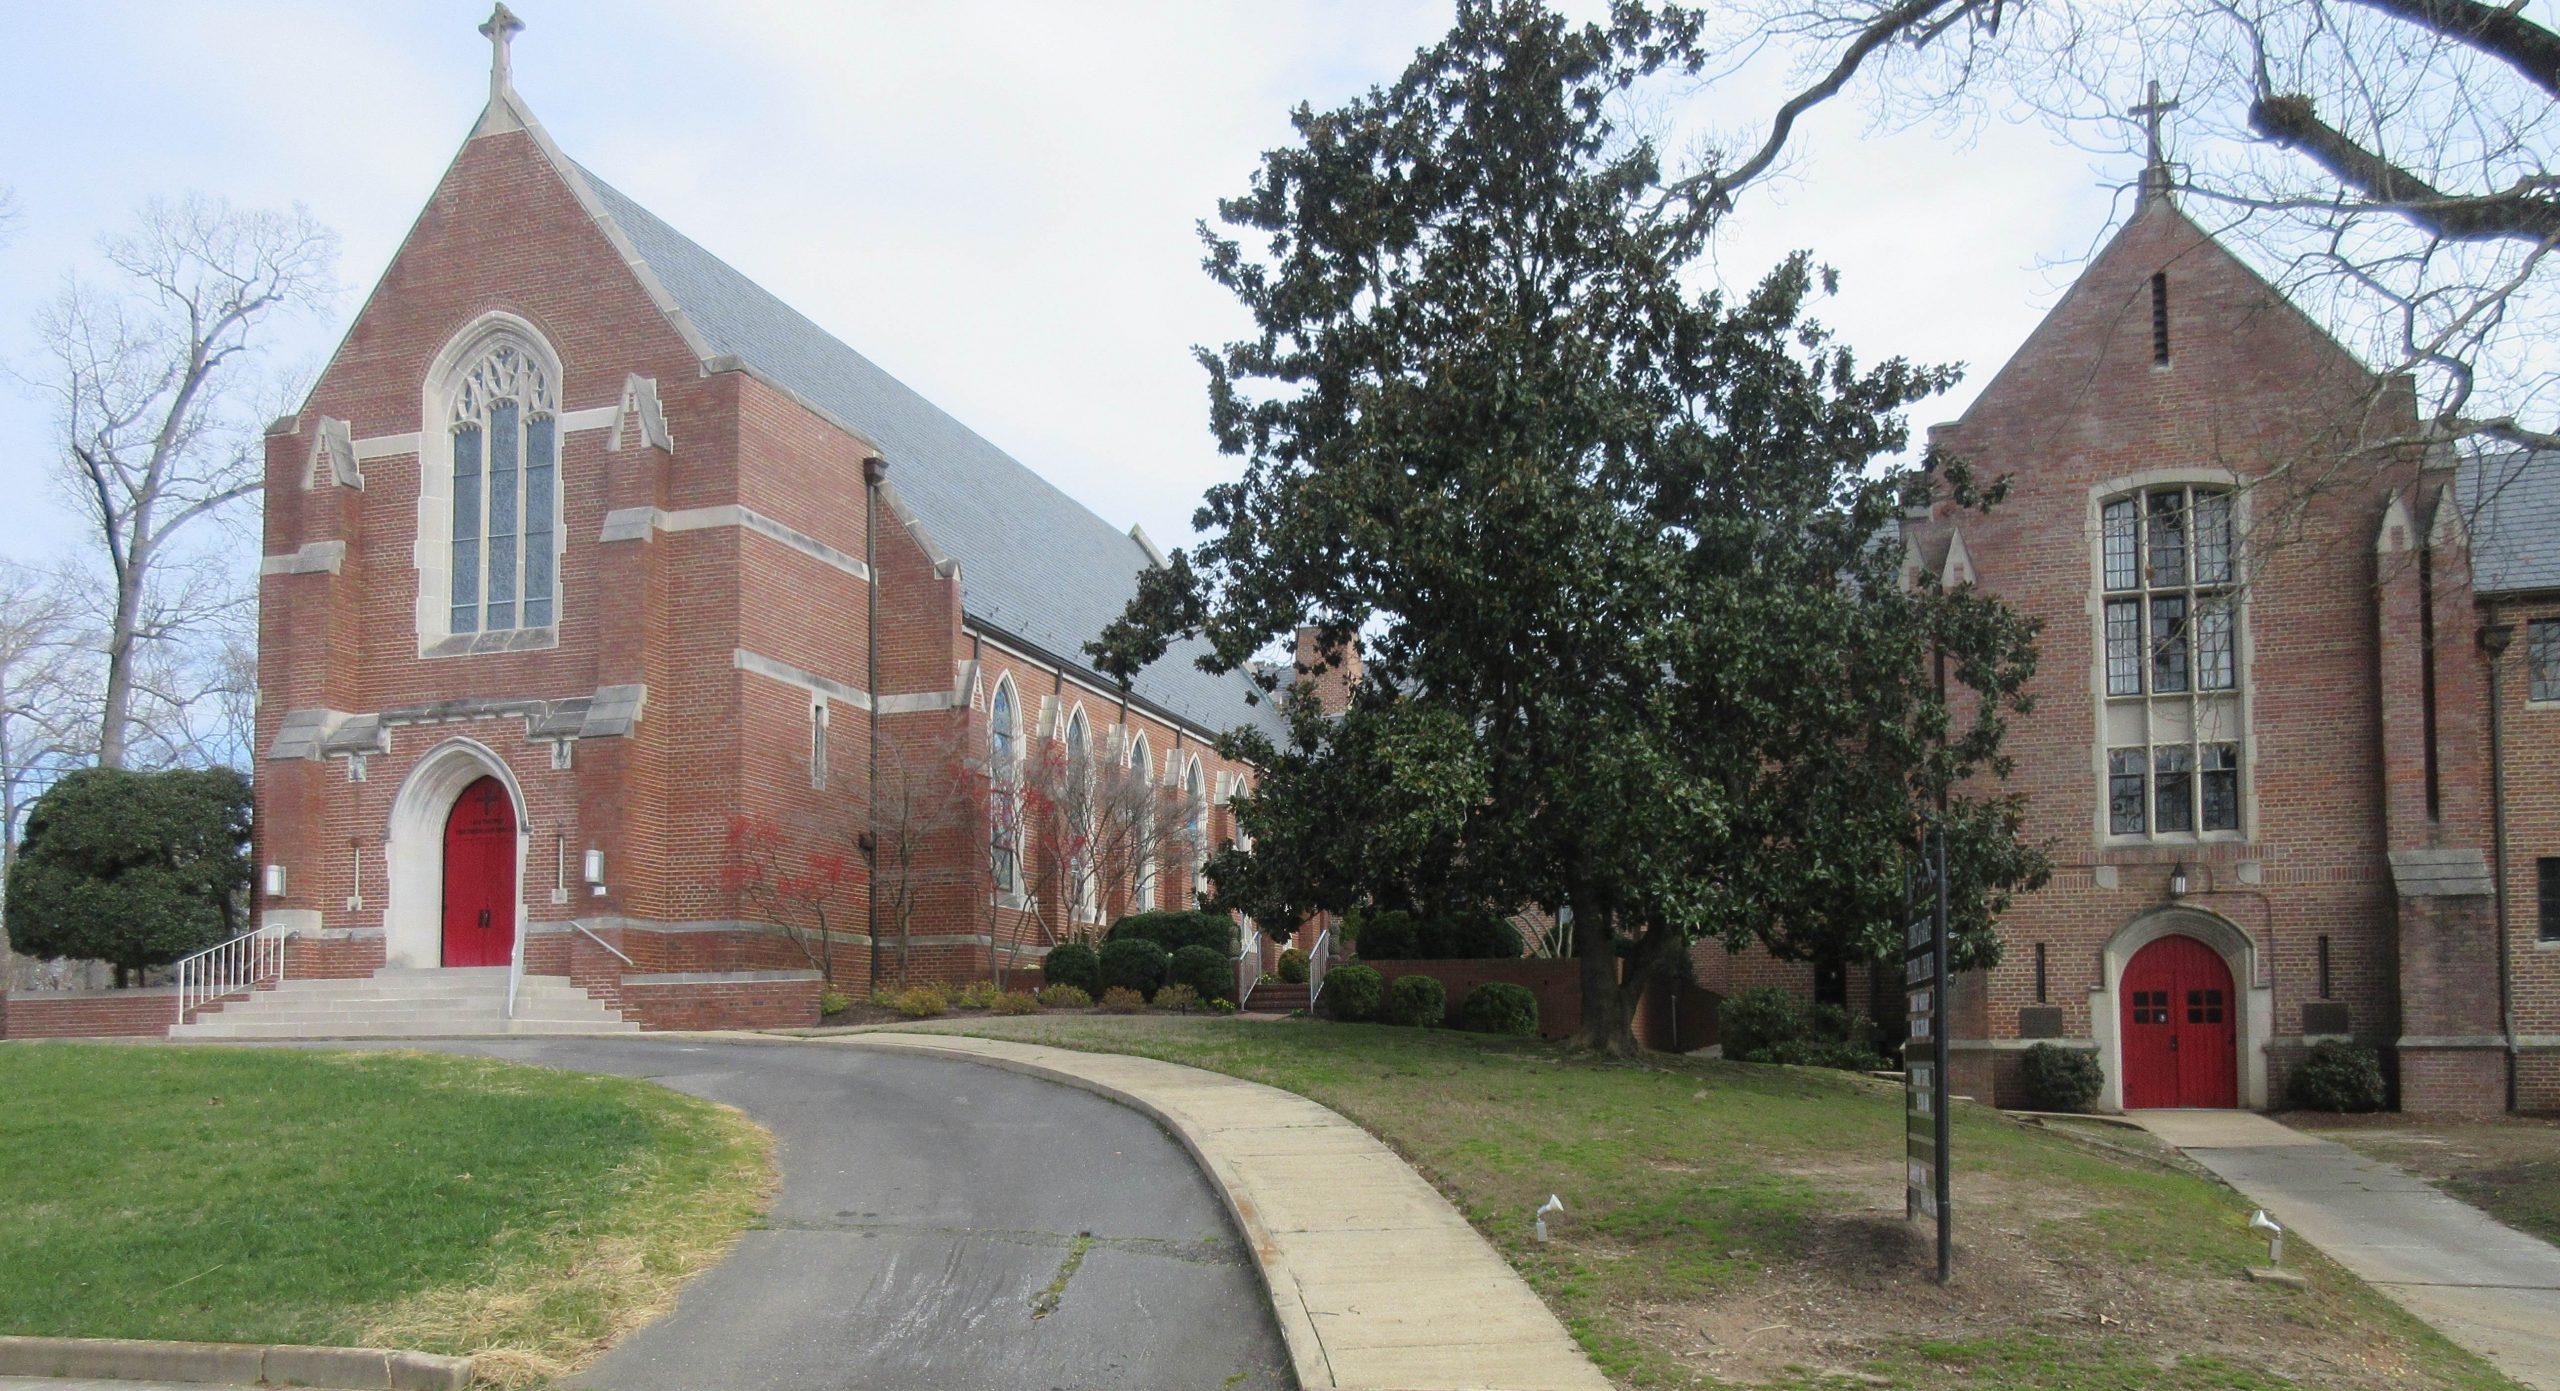 Christ and Grace Episcopal Church